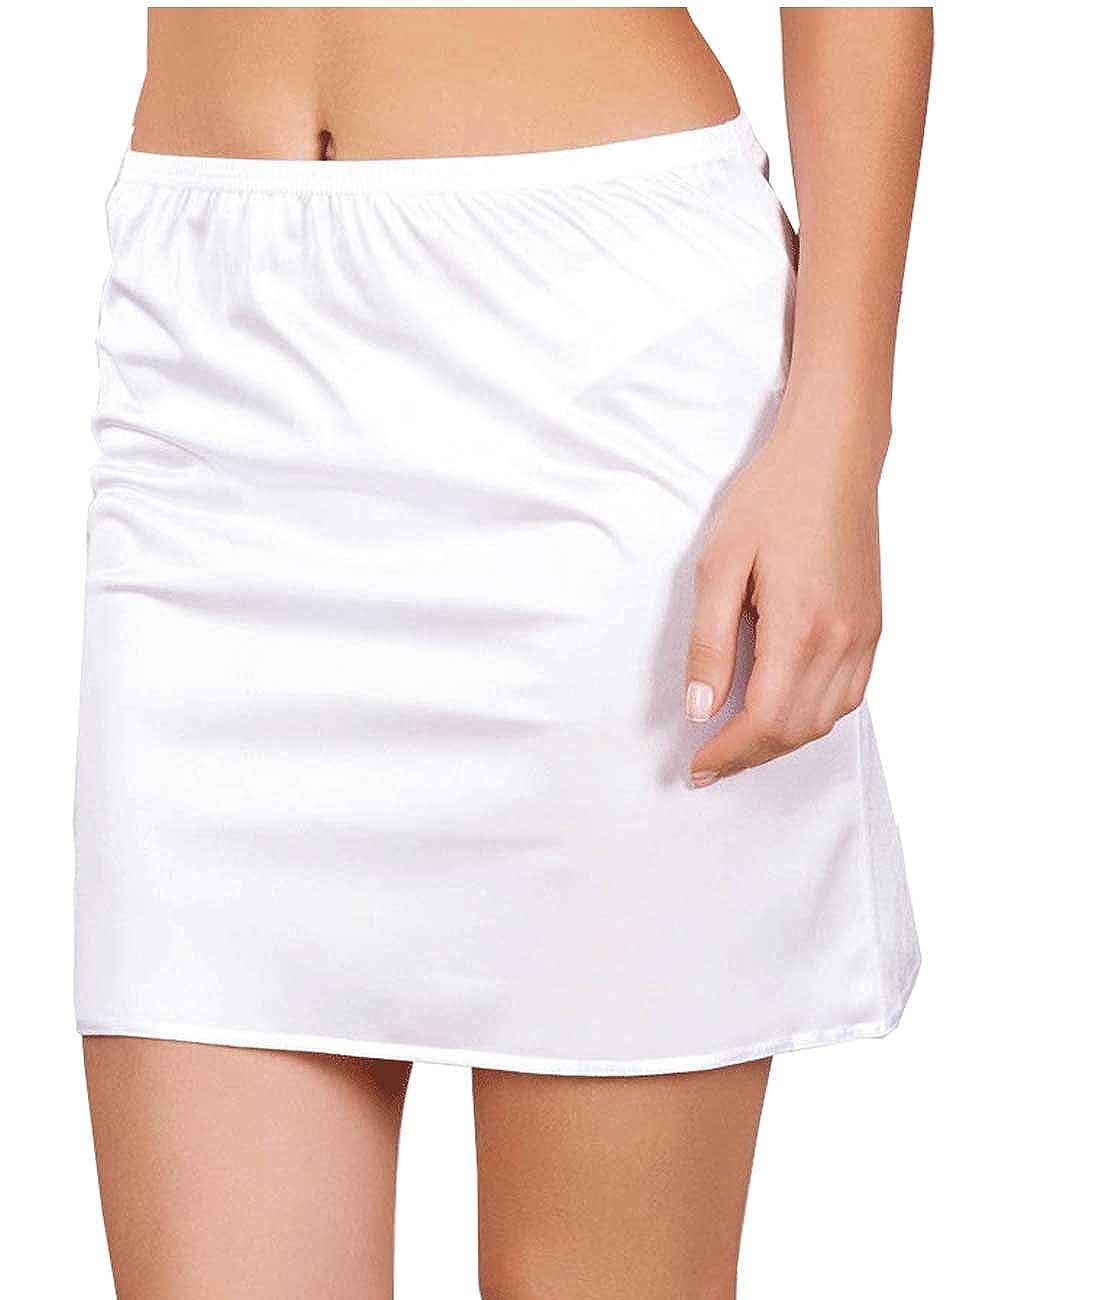 Damen Unterrock Kurz  Beige Schwarz Weiß Jupon Unterkleid S M L XL NBB Lingerie